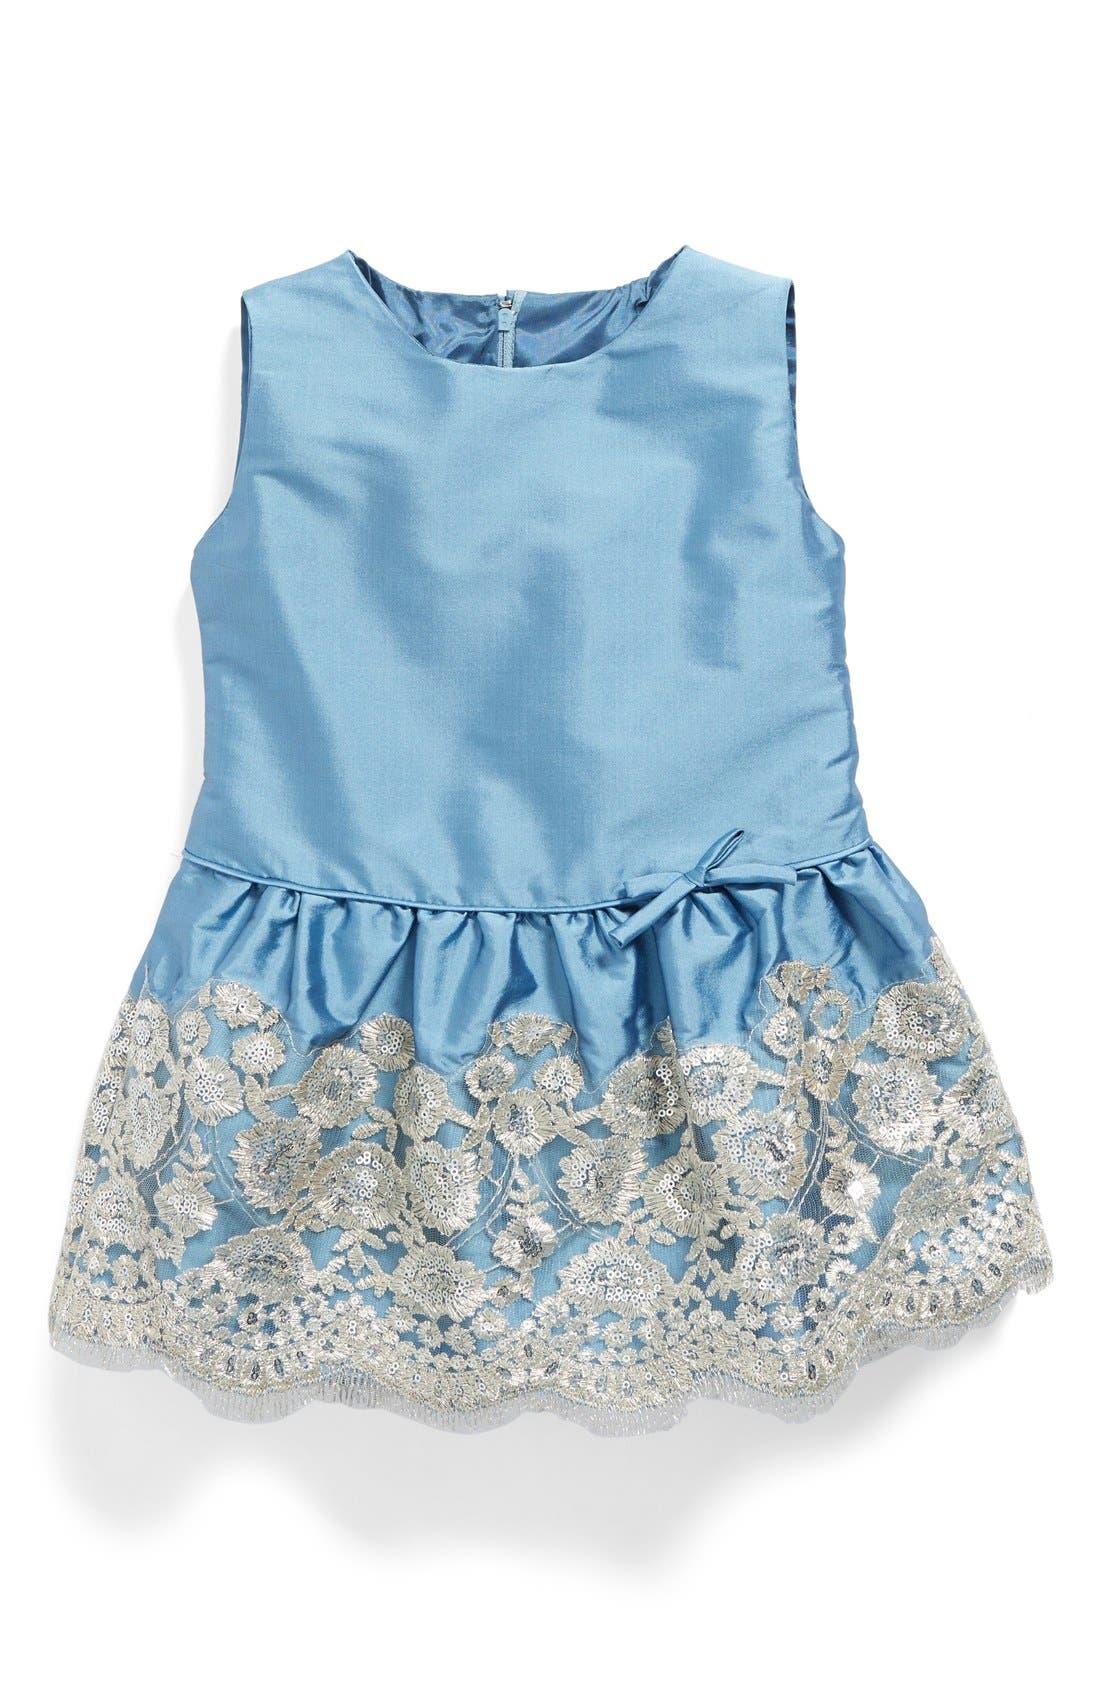 Drop Waist Dress,                         Main,                         color, 400